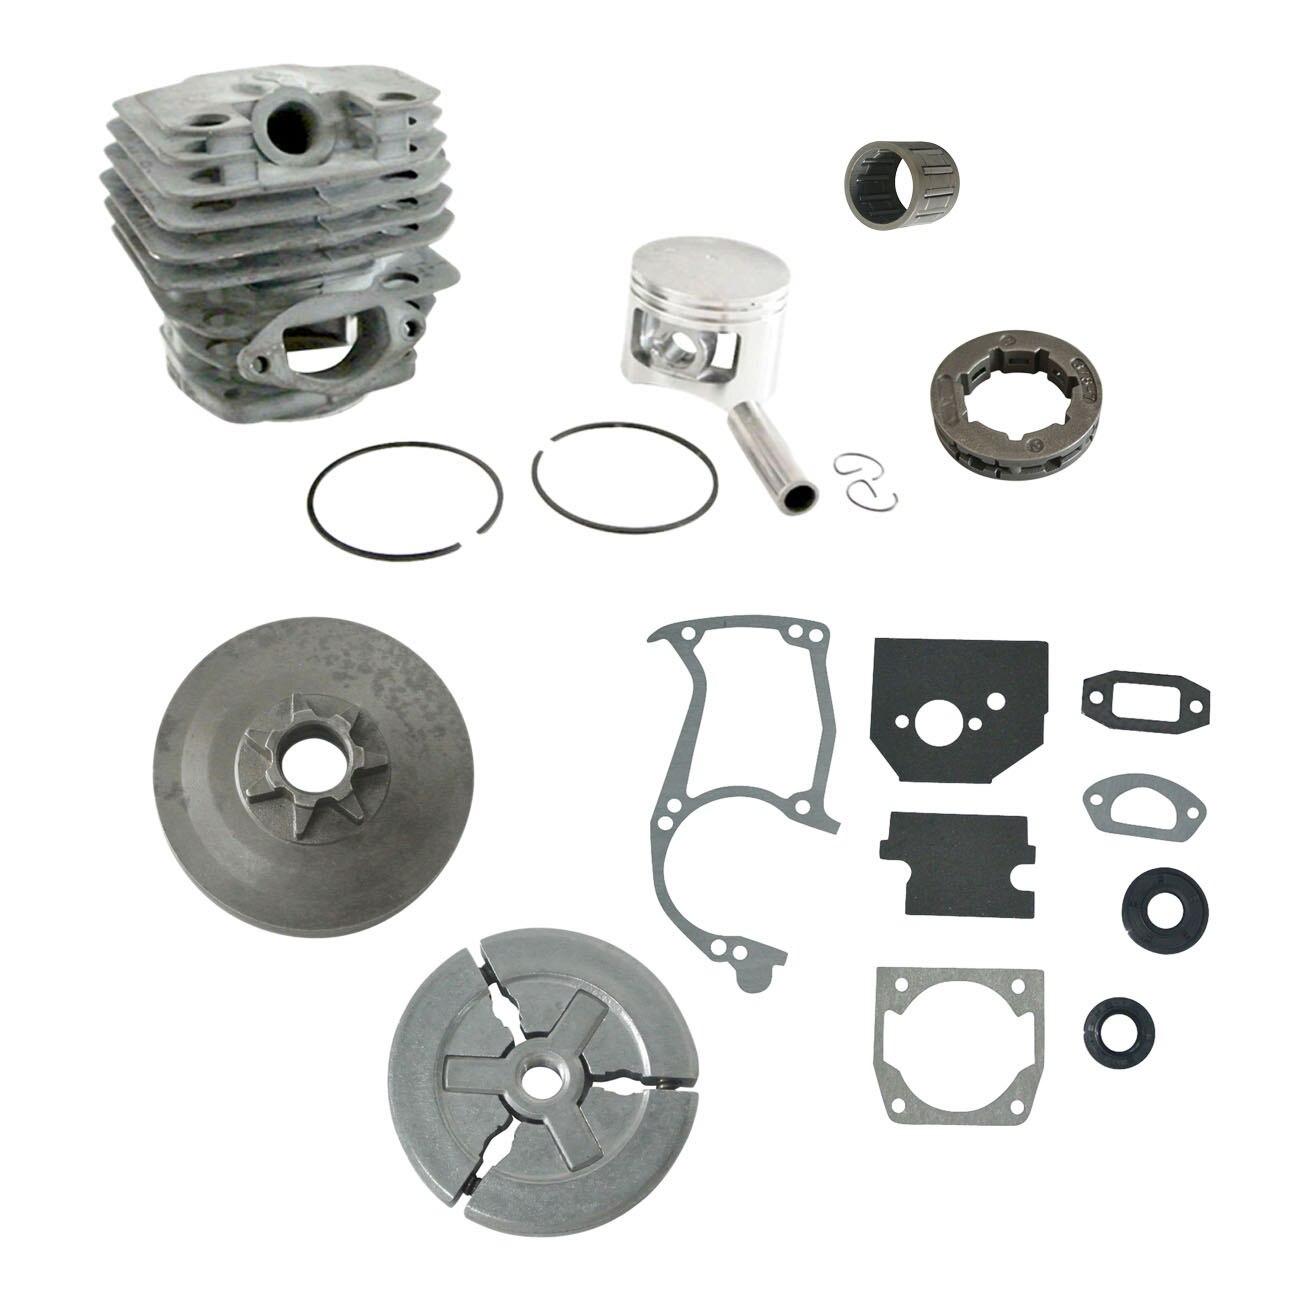 45MM Cylinder Piston Kit W/Full Gasket 3/8 7T Sprocket Rim Fit BBT 5200 Chainsaw rim sprocket